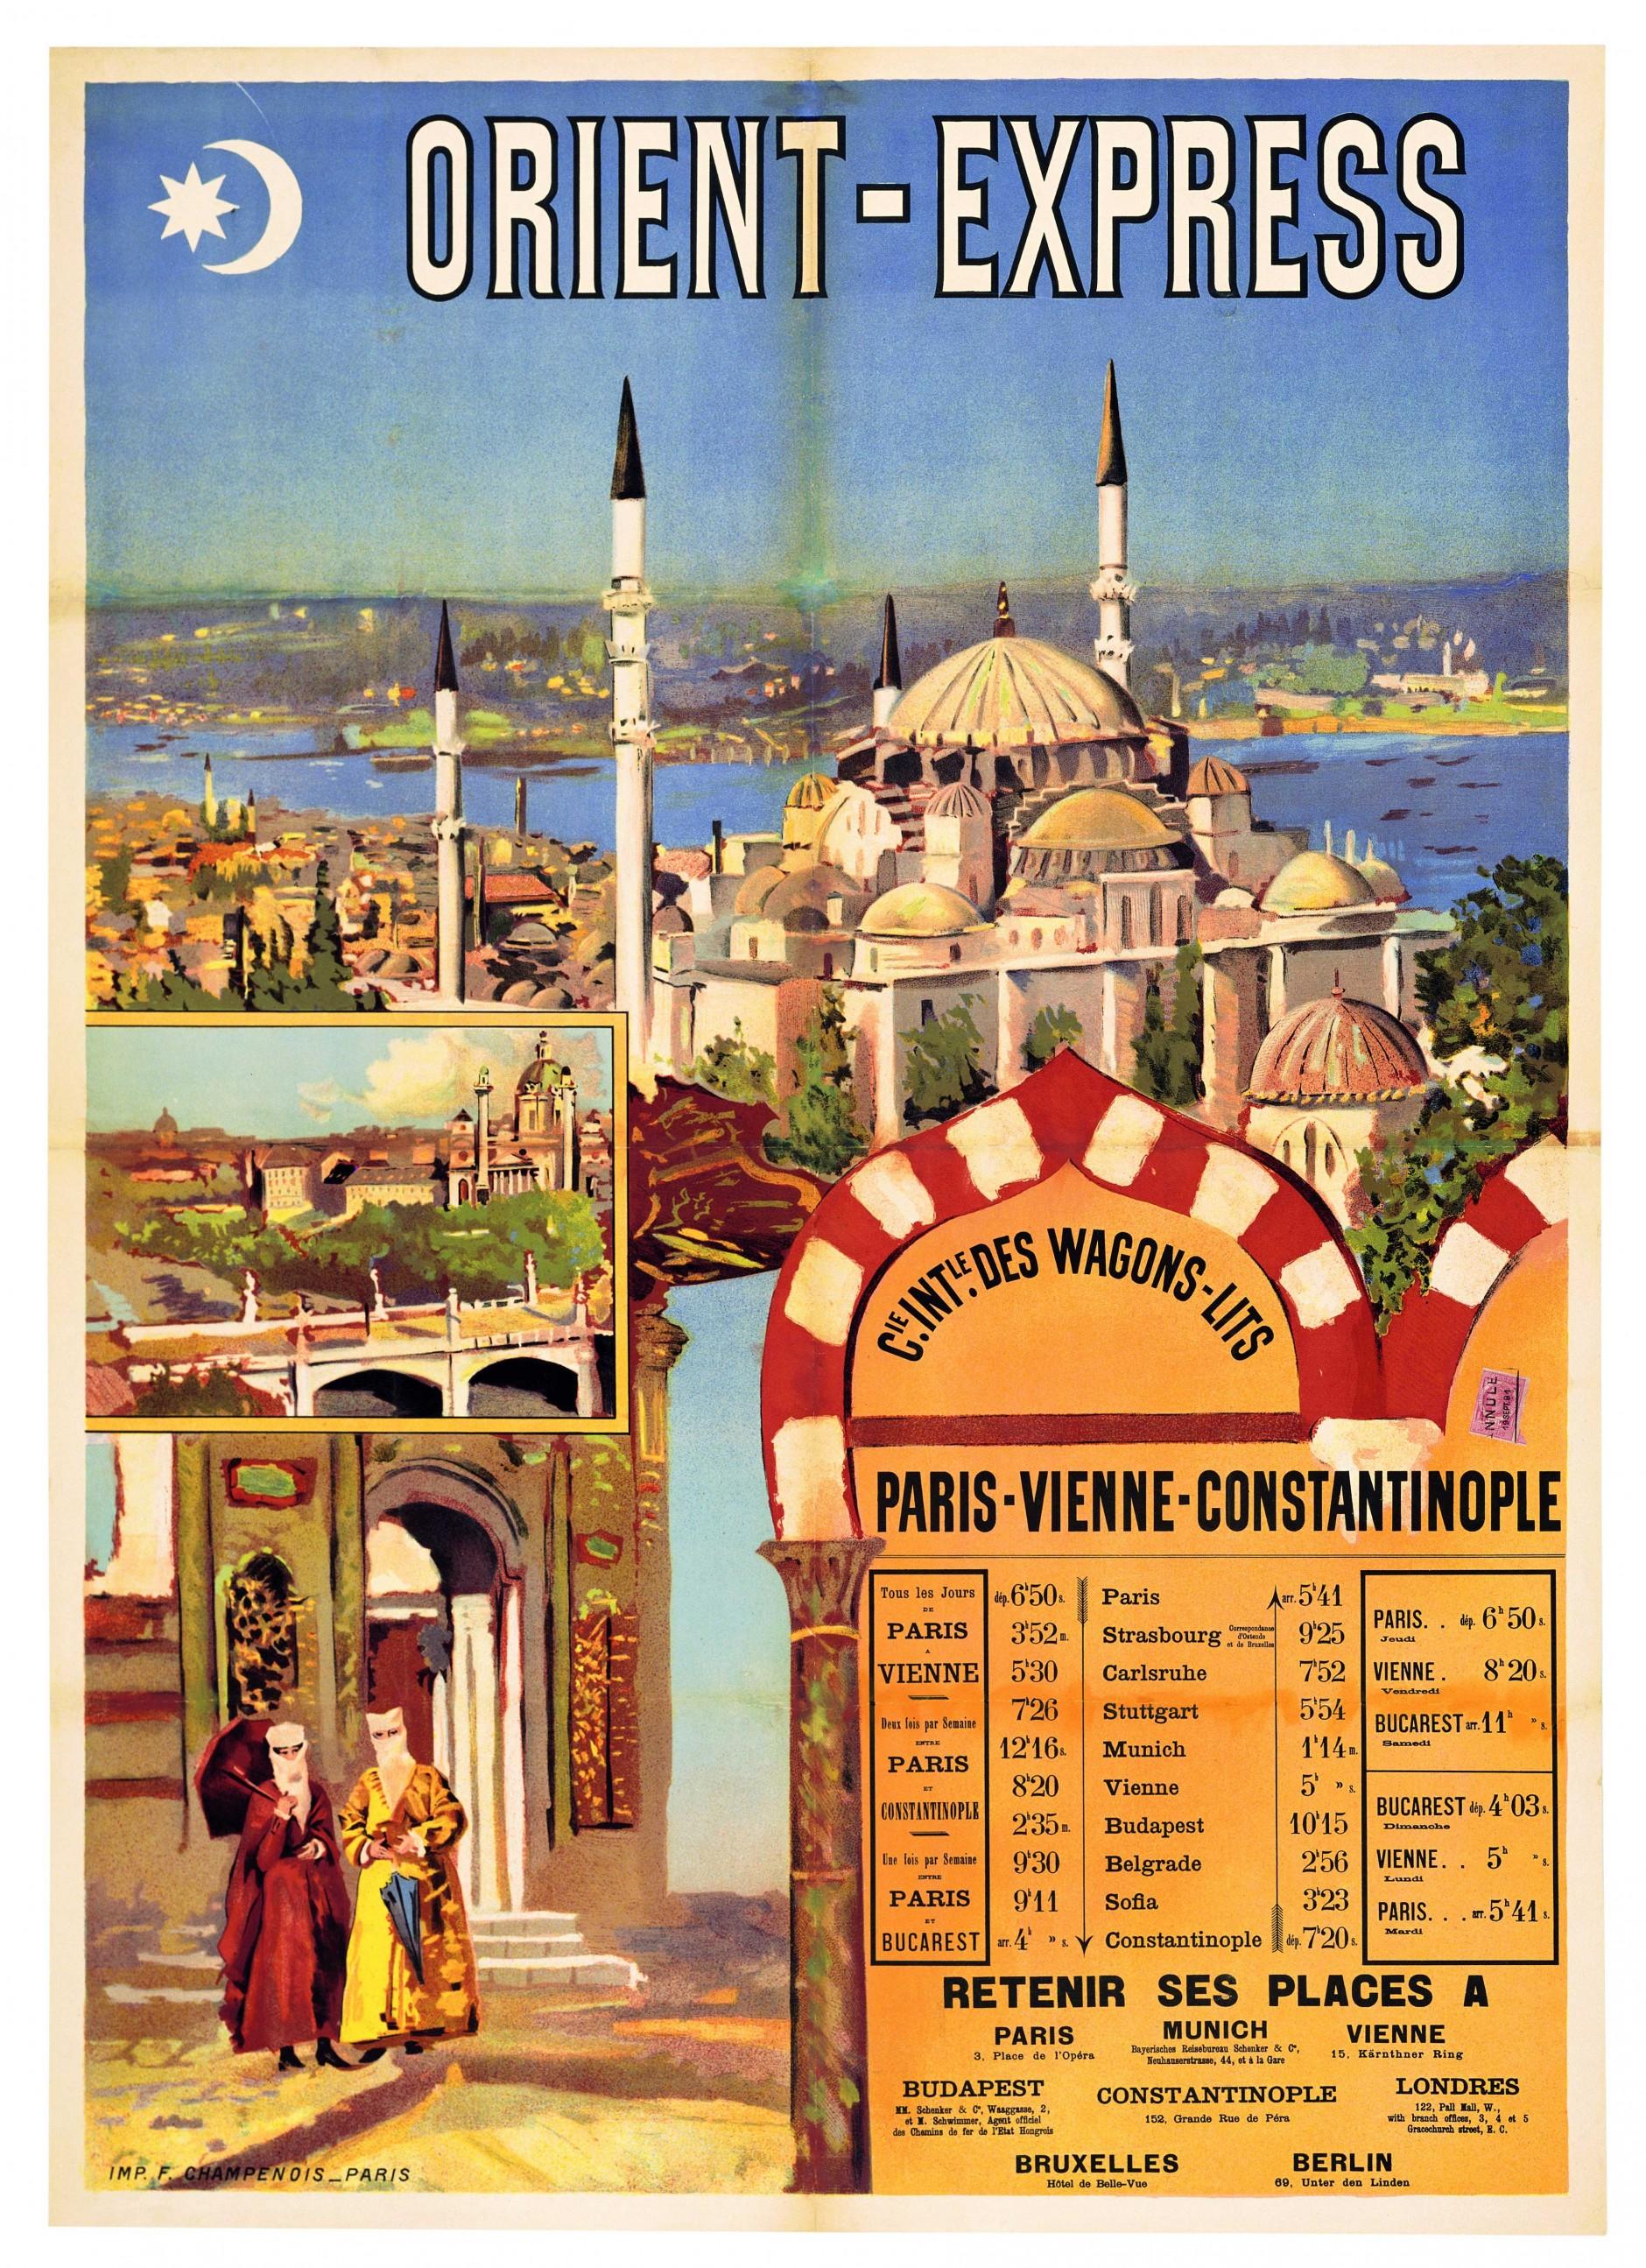 Europa-OrientExpress 1891